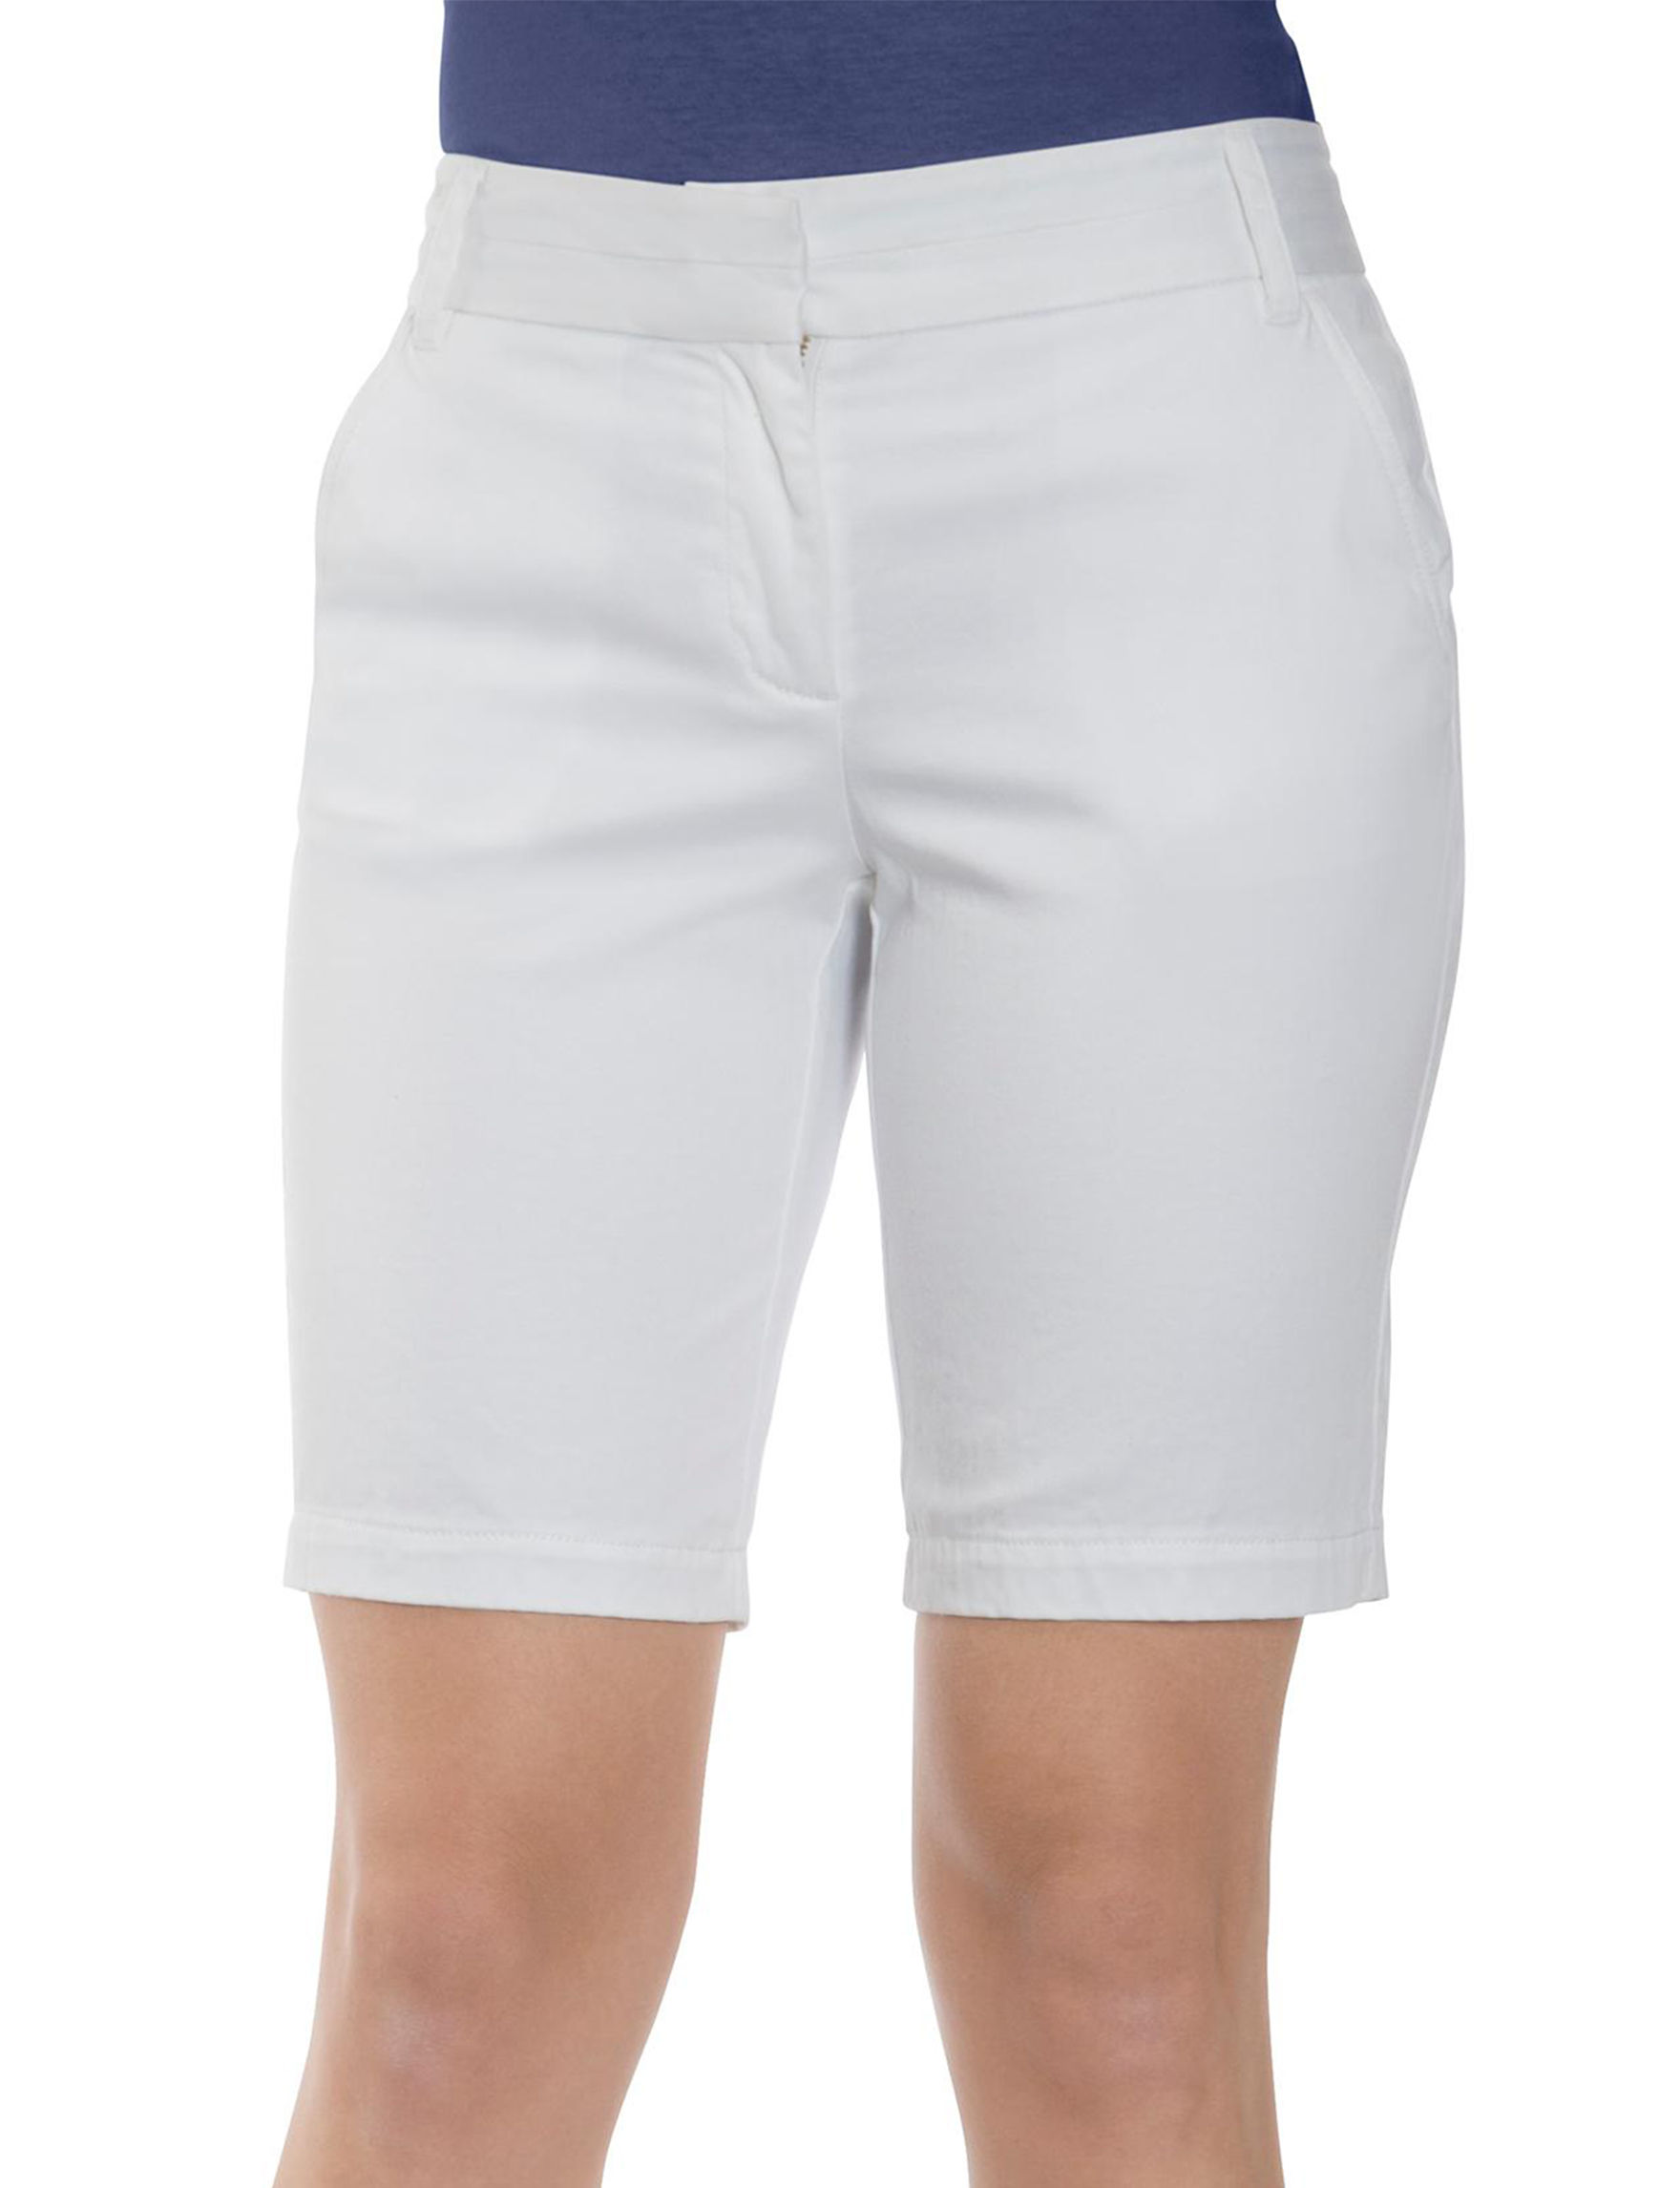 Izod White Denim Shorts